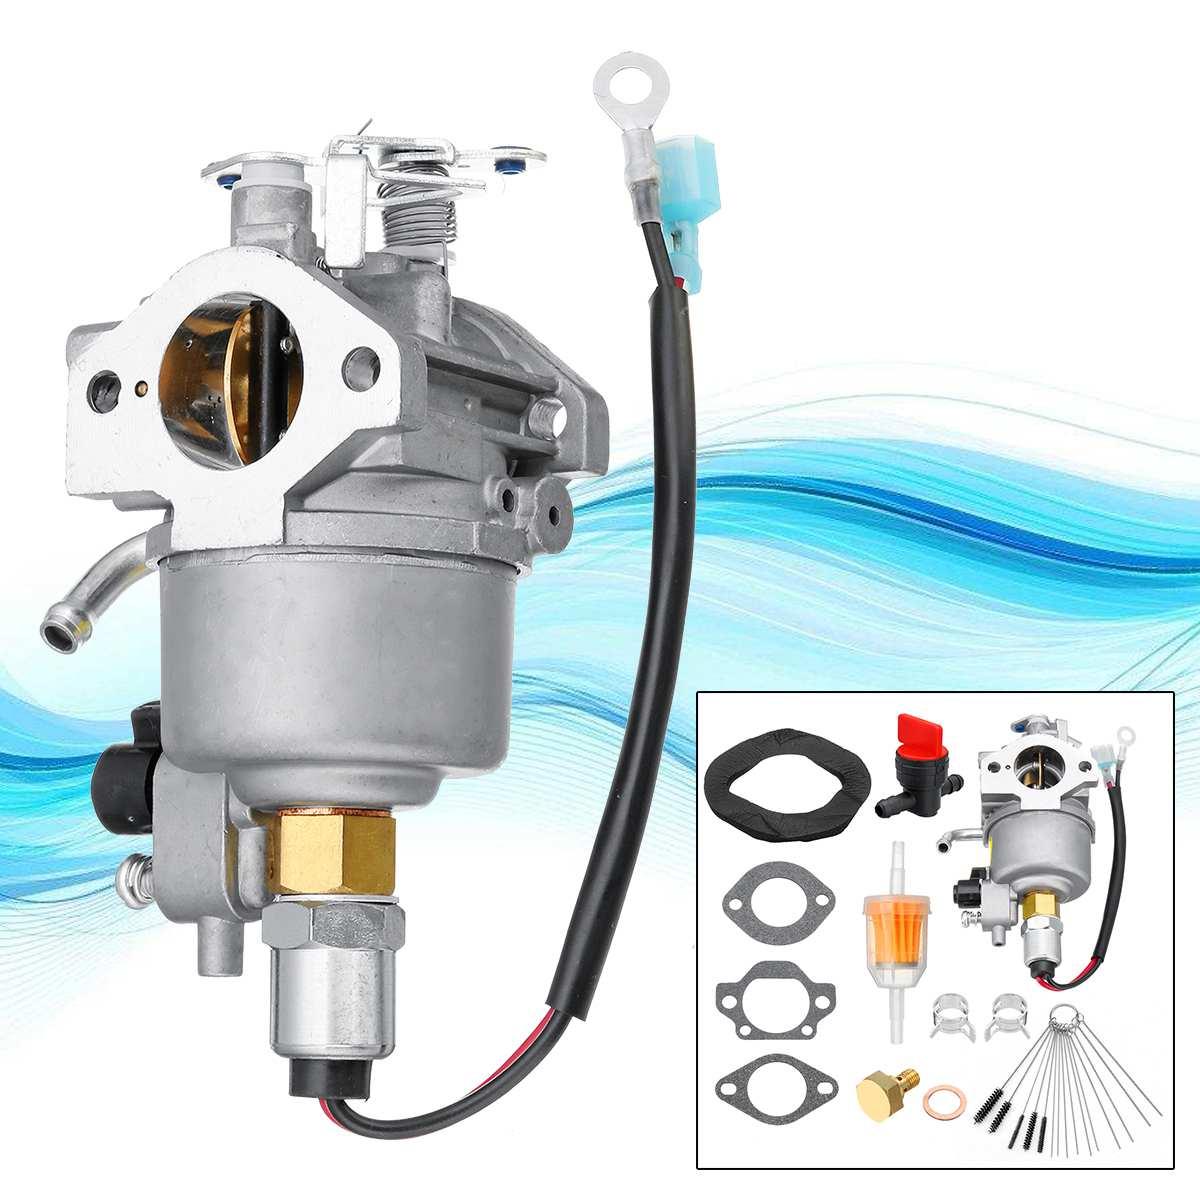 small resolution of carburetor rebuild kit replaces onan kit a041d736 for onan engine model onan marvel schebler model 4000w 4kyfa26100 in carburetors from automobiles